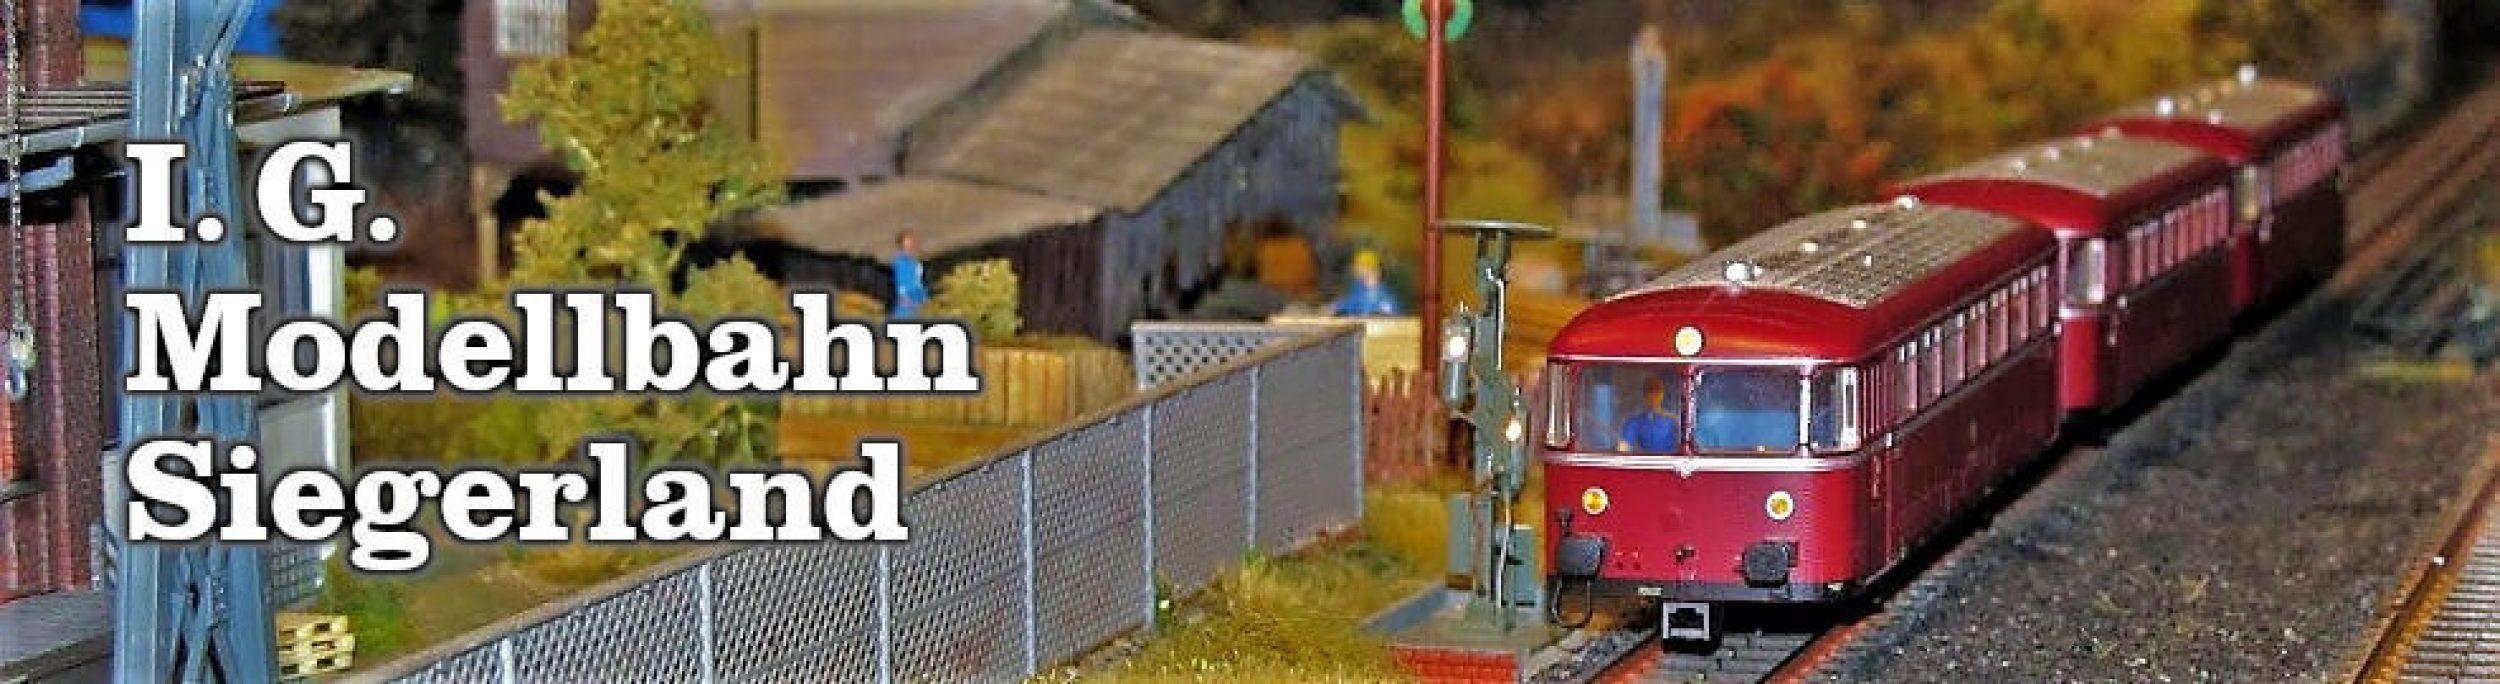 IGMS – I. G. Modellbahn Siegerland